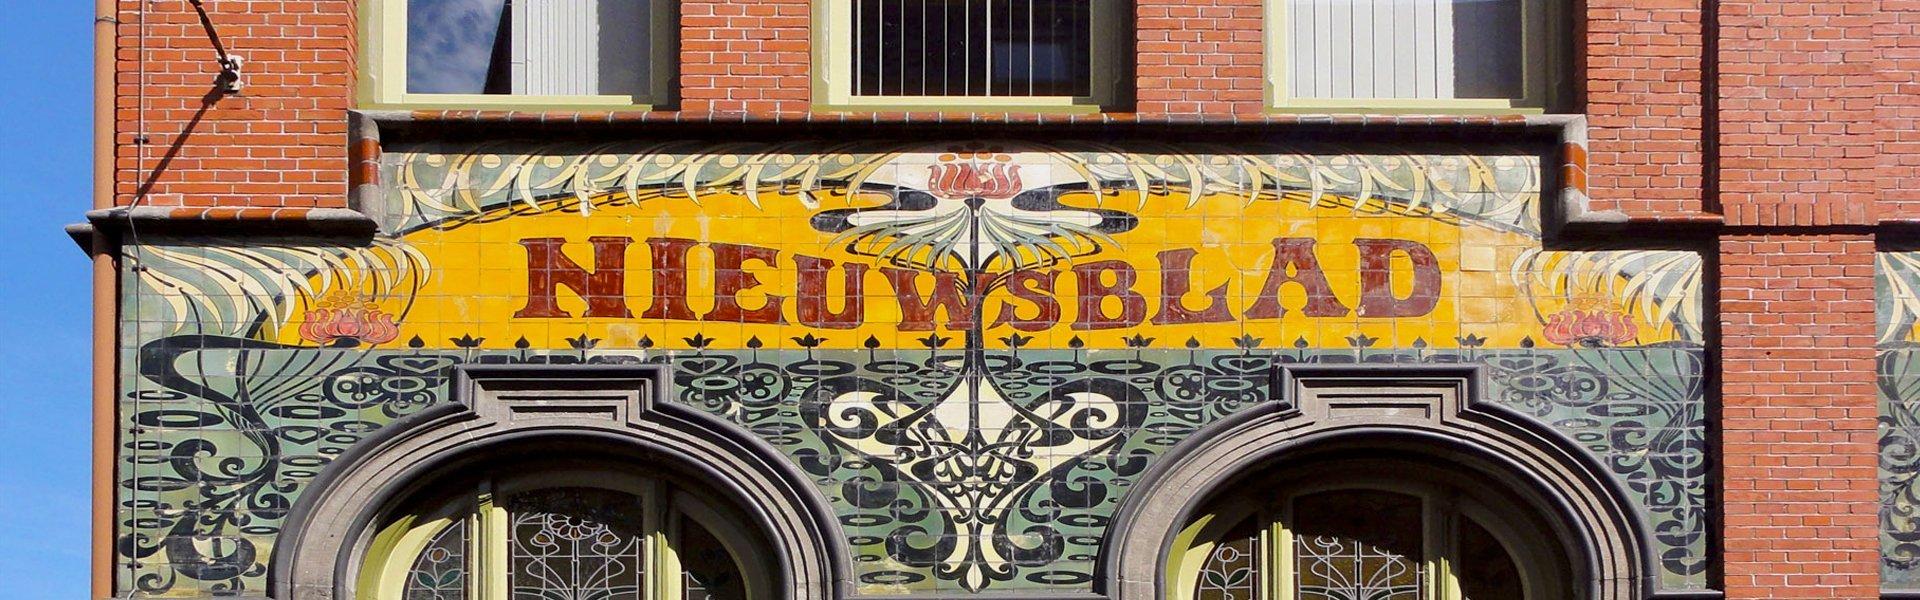 Art nouveau in Groningen, Nederland